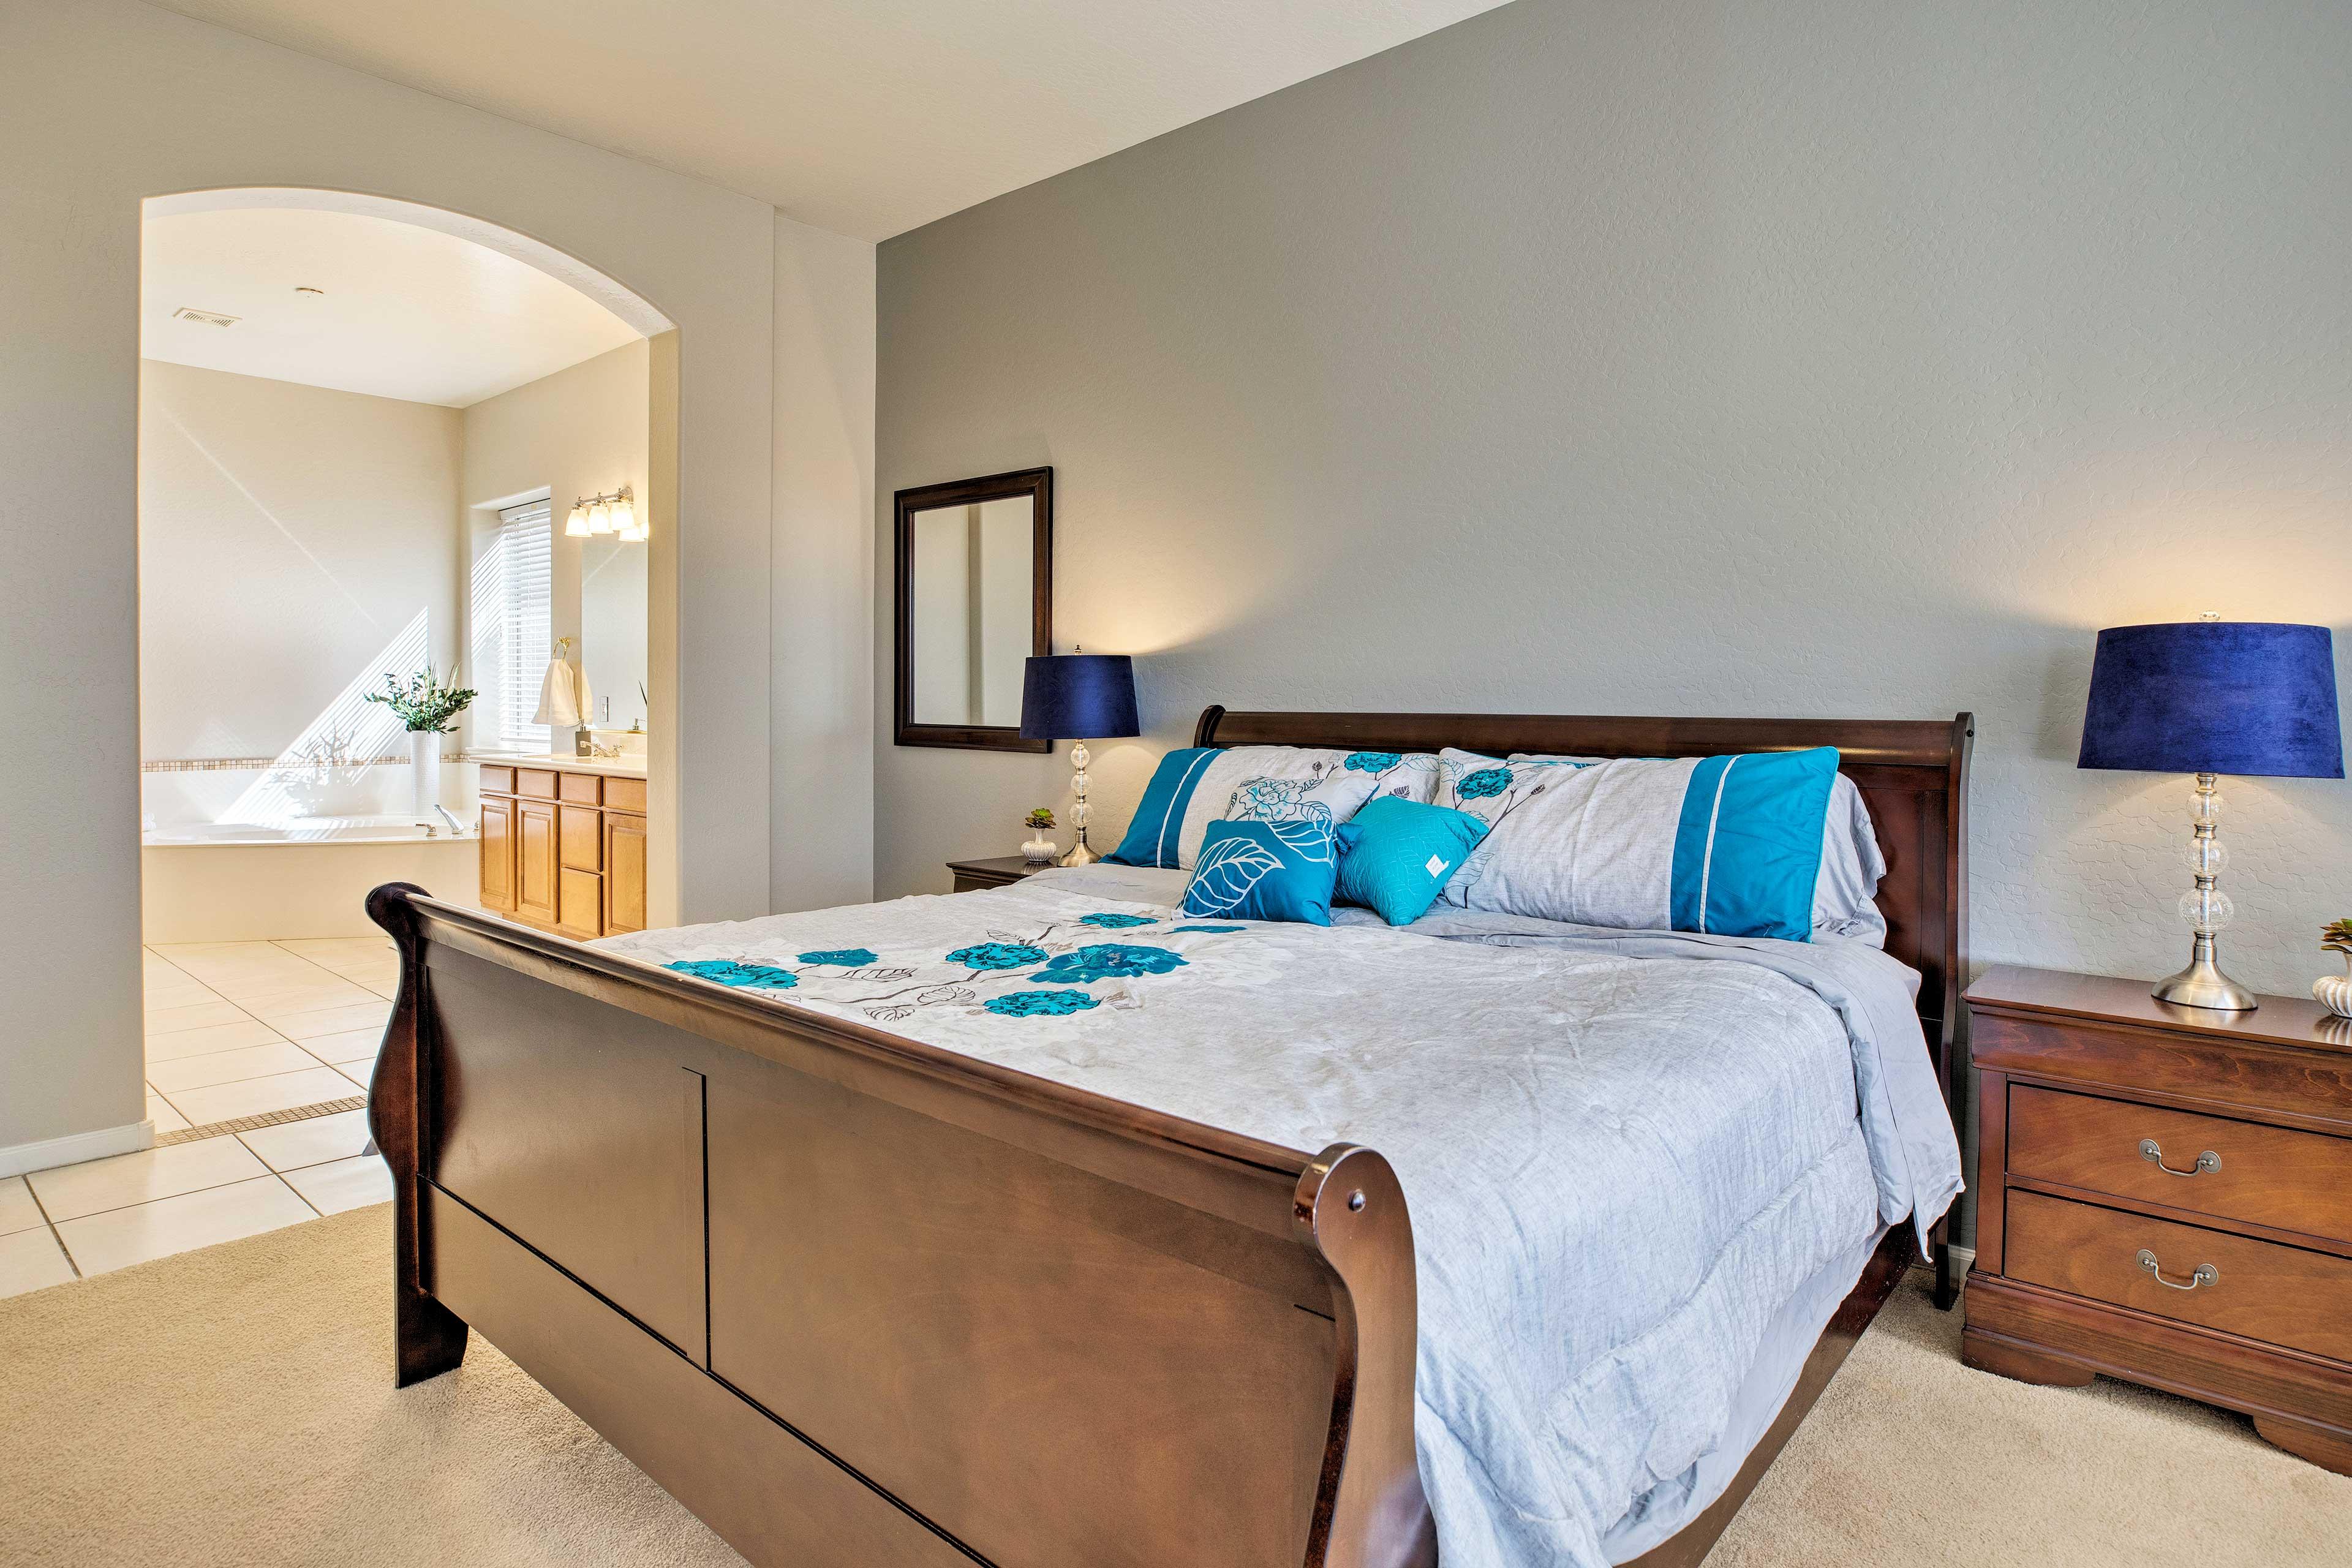 The master bedroom is complete with an en-suite bathroom.